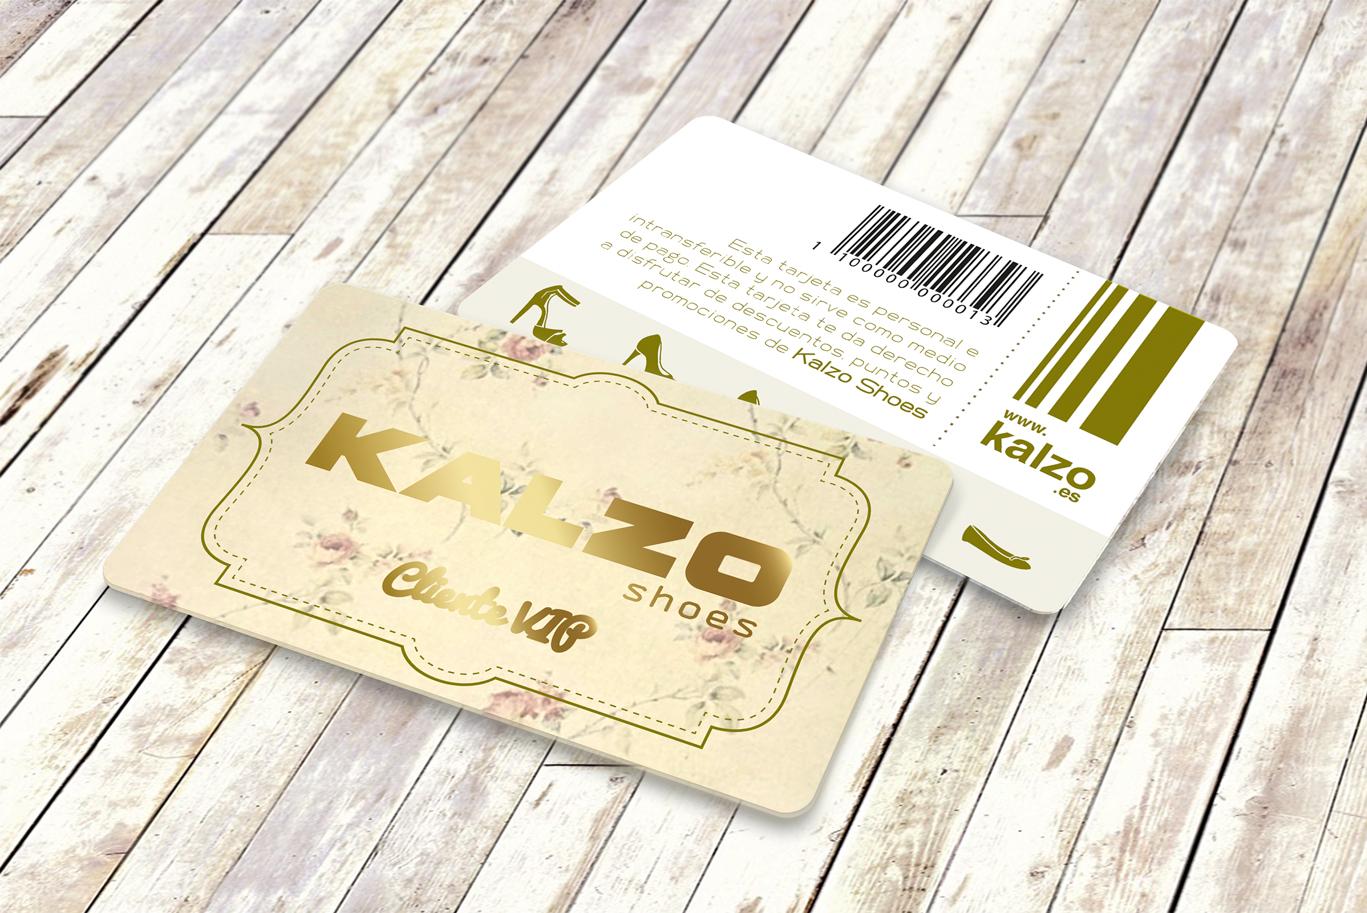 Diseño gráfico, diseño grafico Albacete e imprenta de tarjetas pvc de cliente vip de zapaterias Kalzo